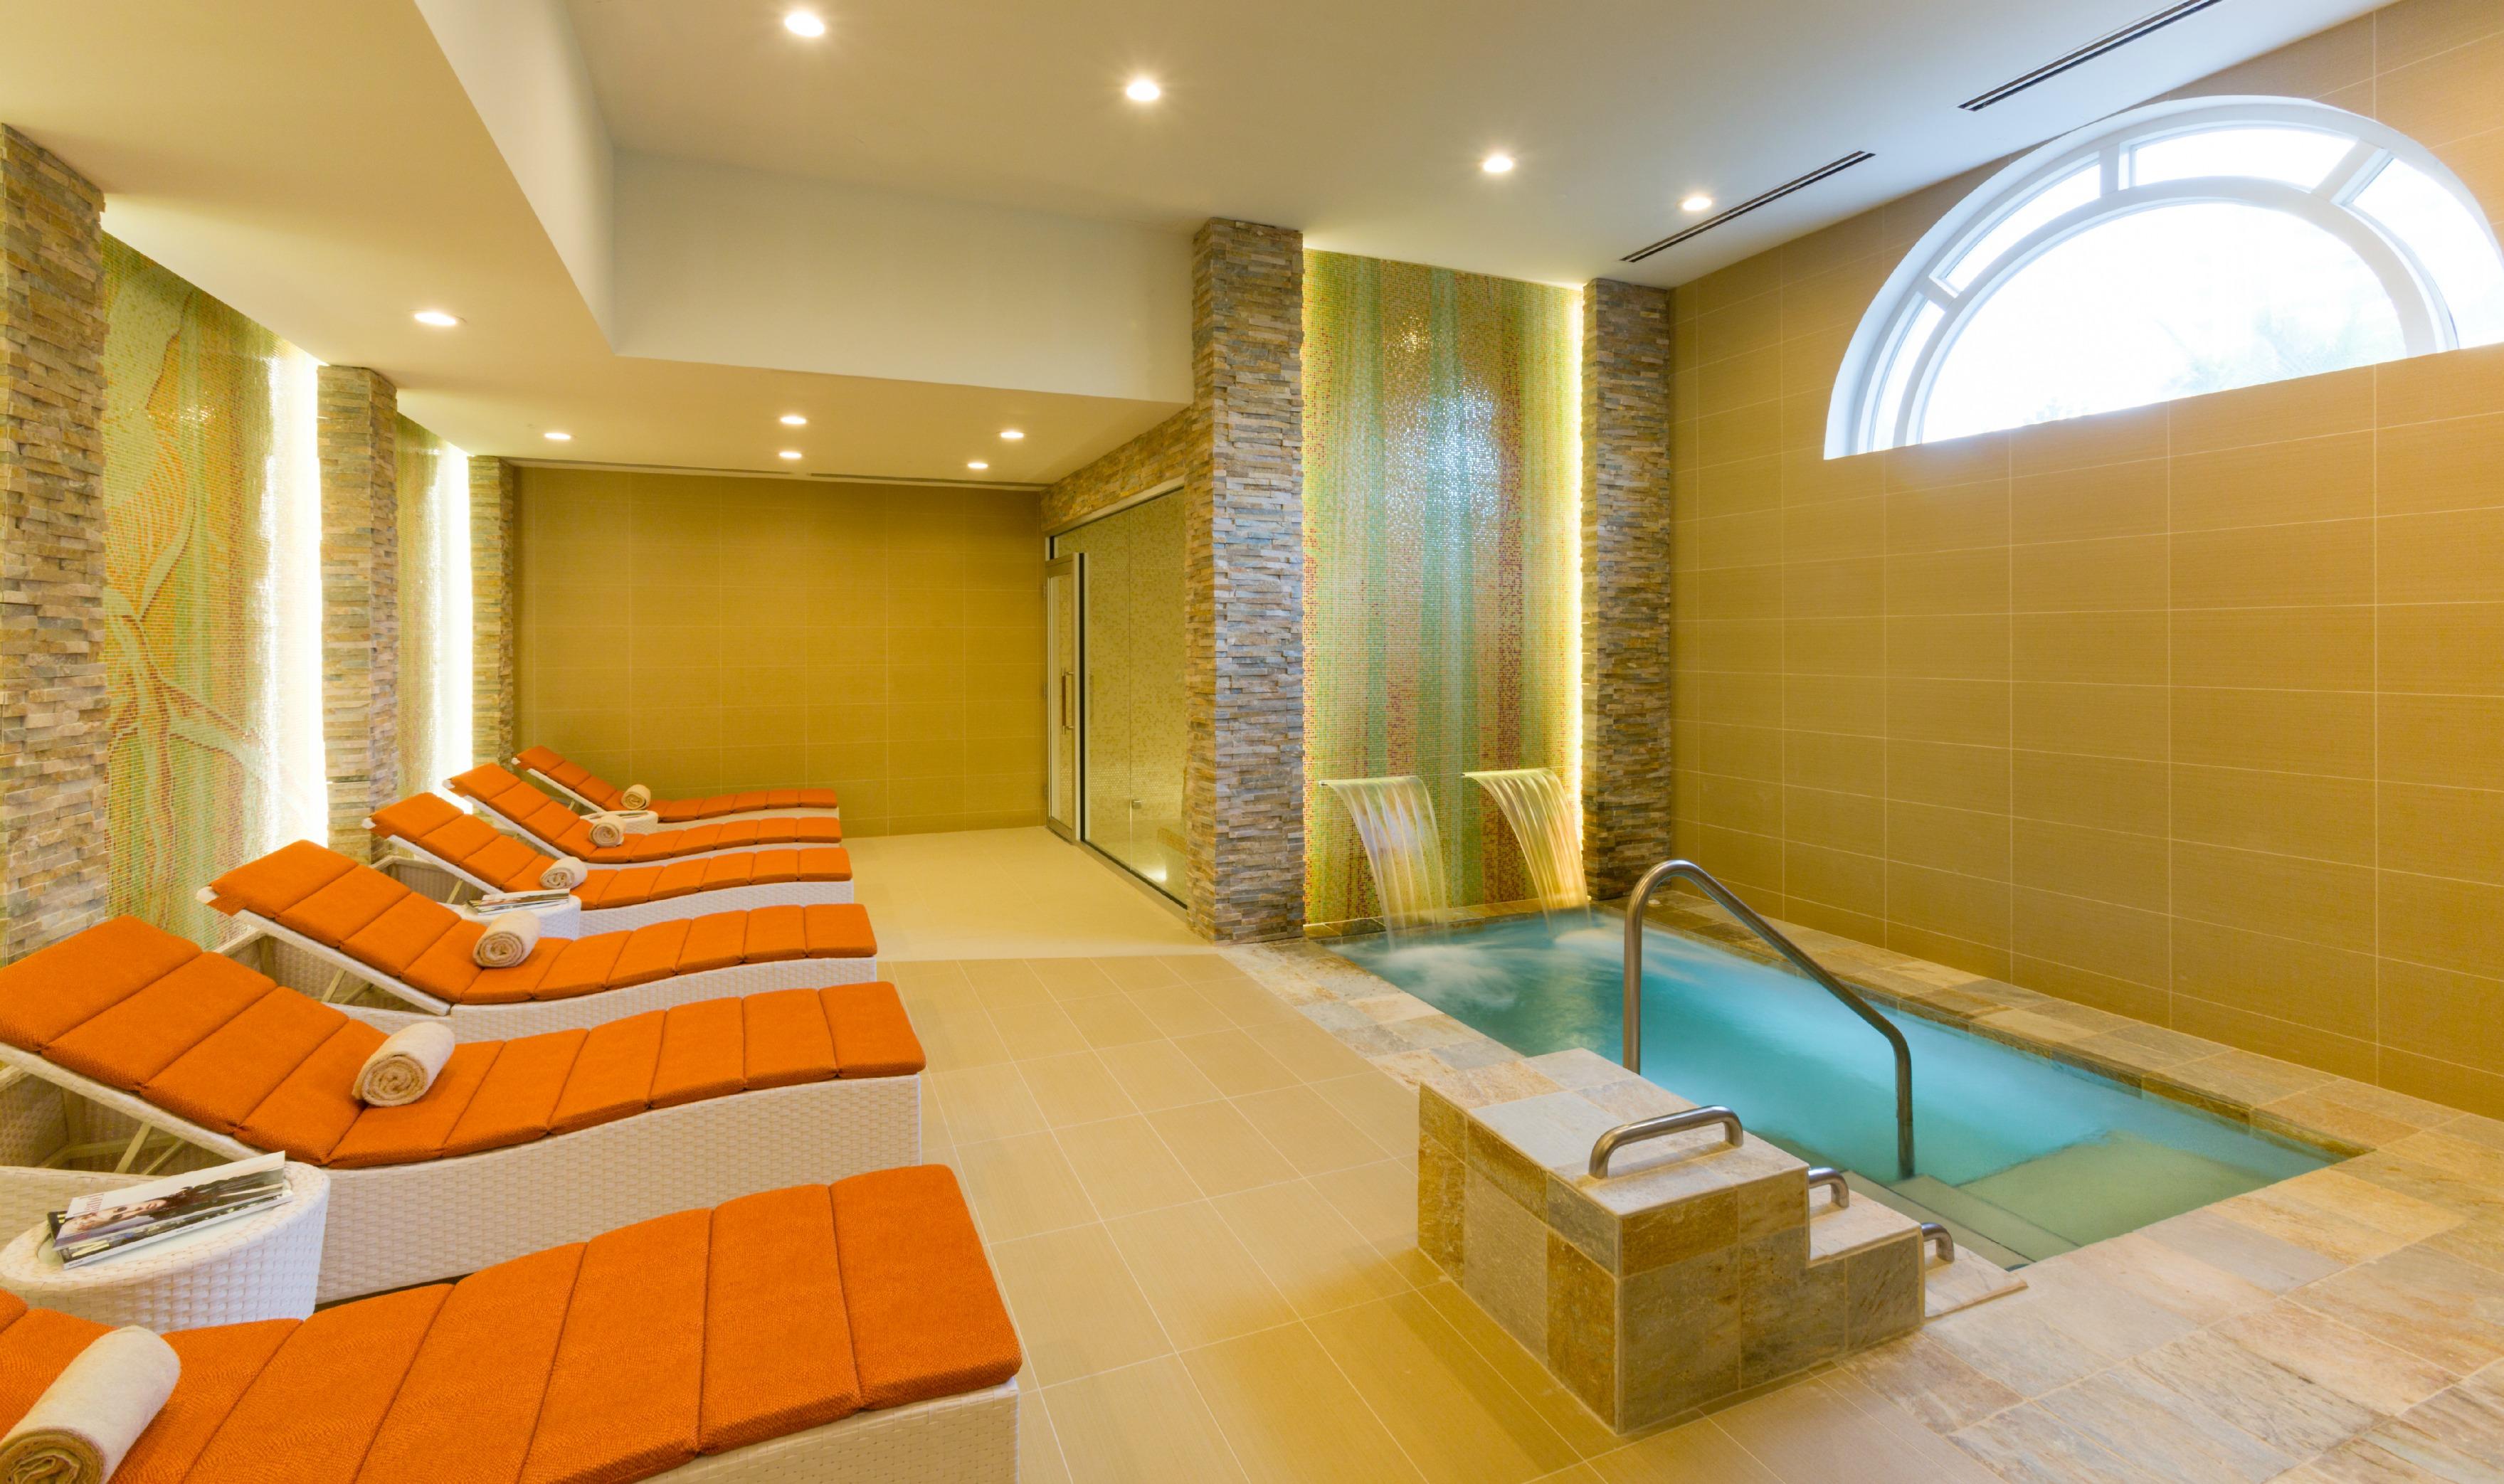 ritz carlton key biscayne hotel spa abstract mosaic mural | artaic